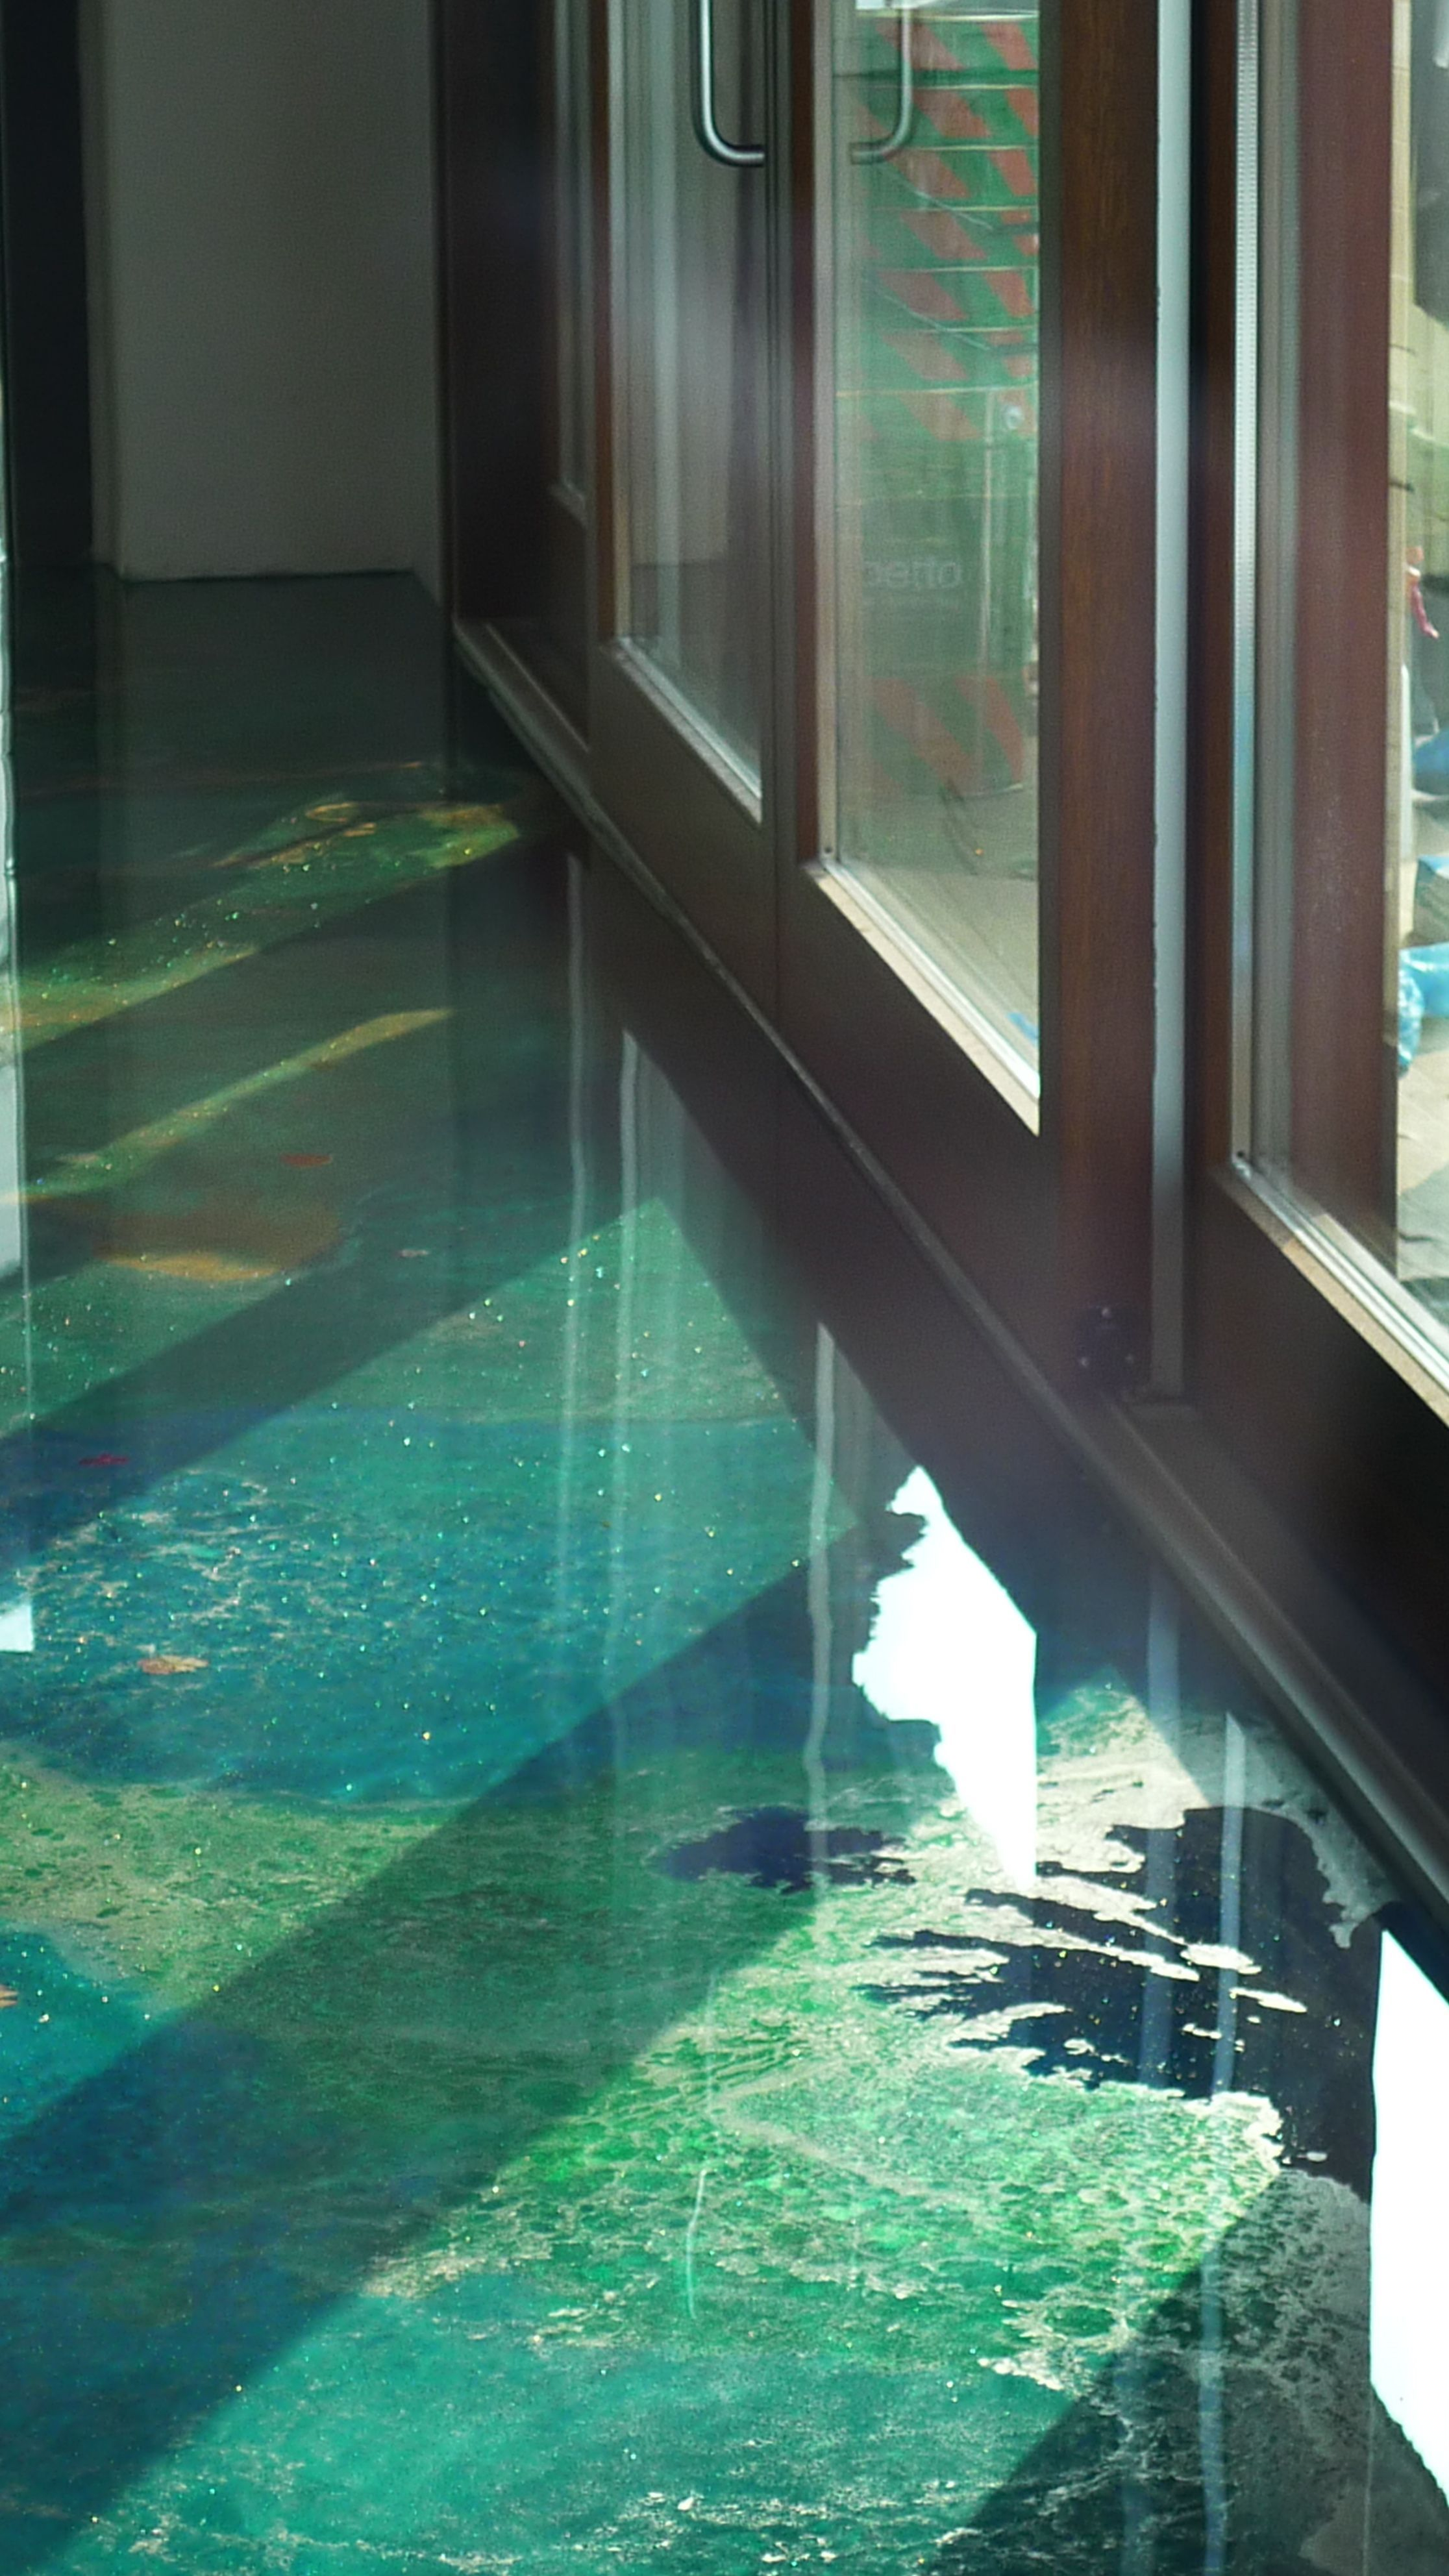 Resine Epoxy Sol Deco epoxy resin - gobbetto dega artmino longo #ideasrezzin